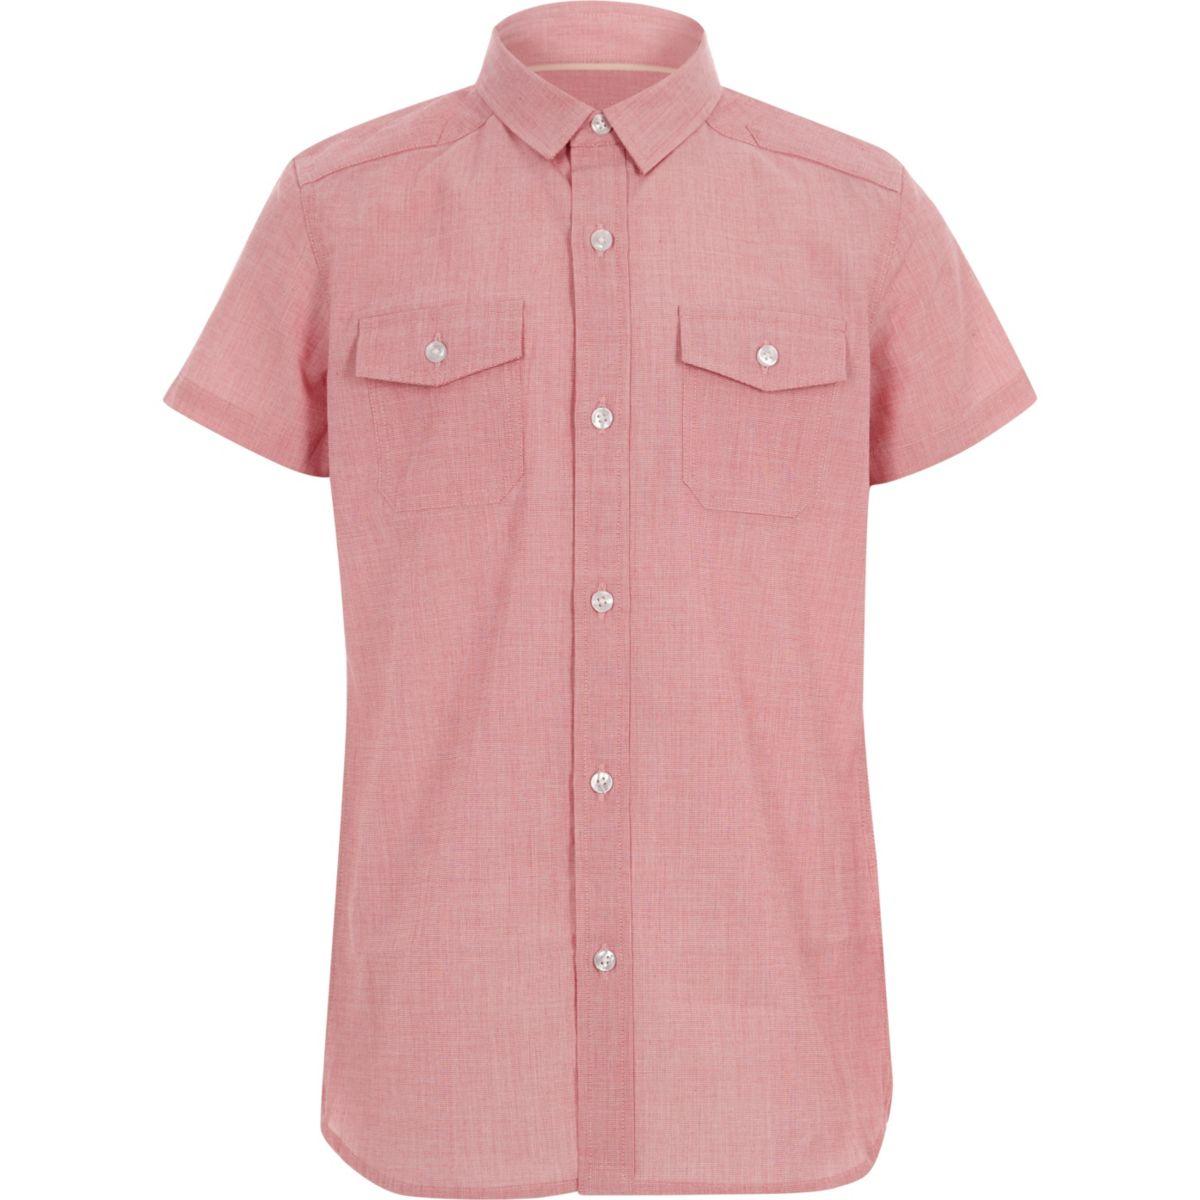 Boys red short sleeve shirt